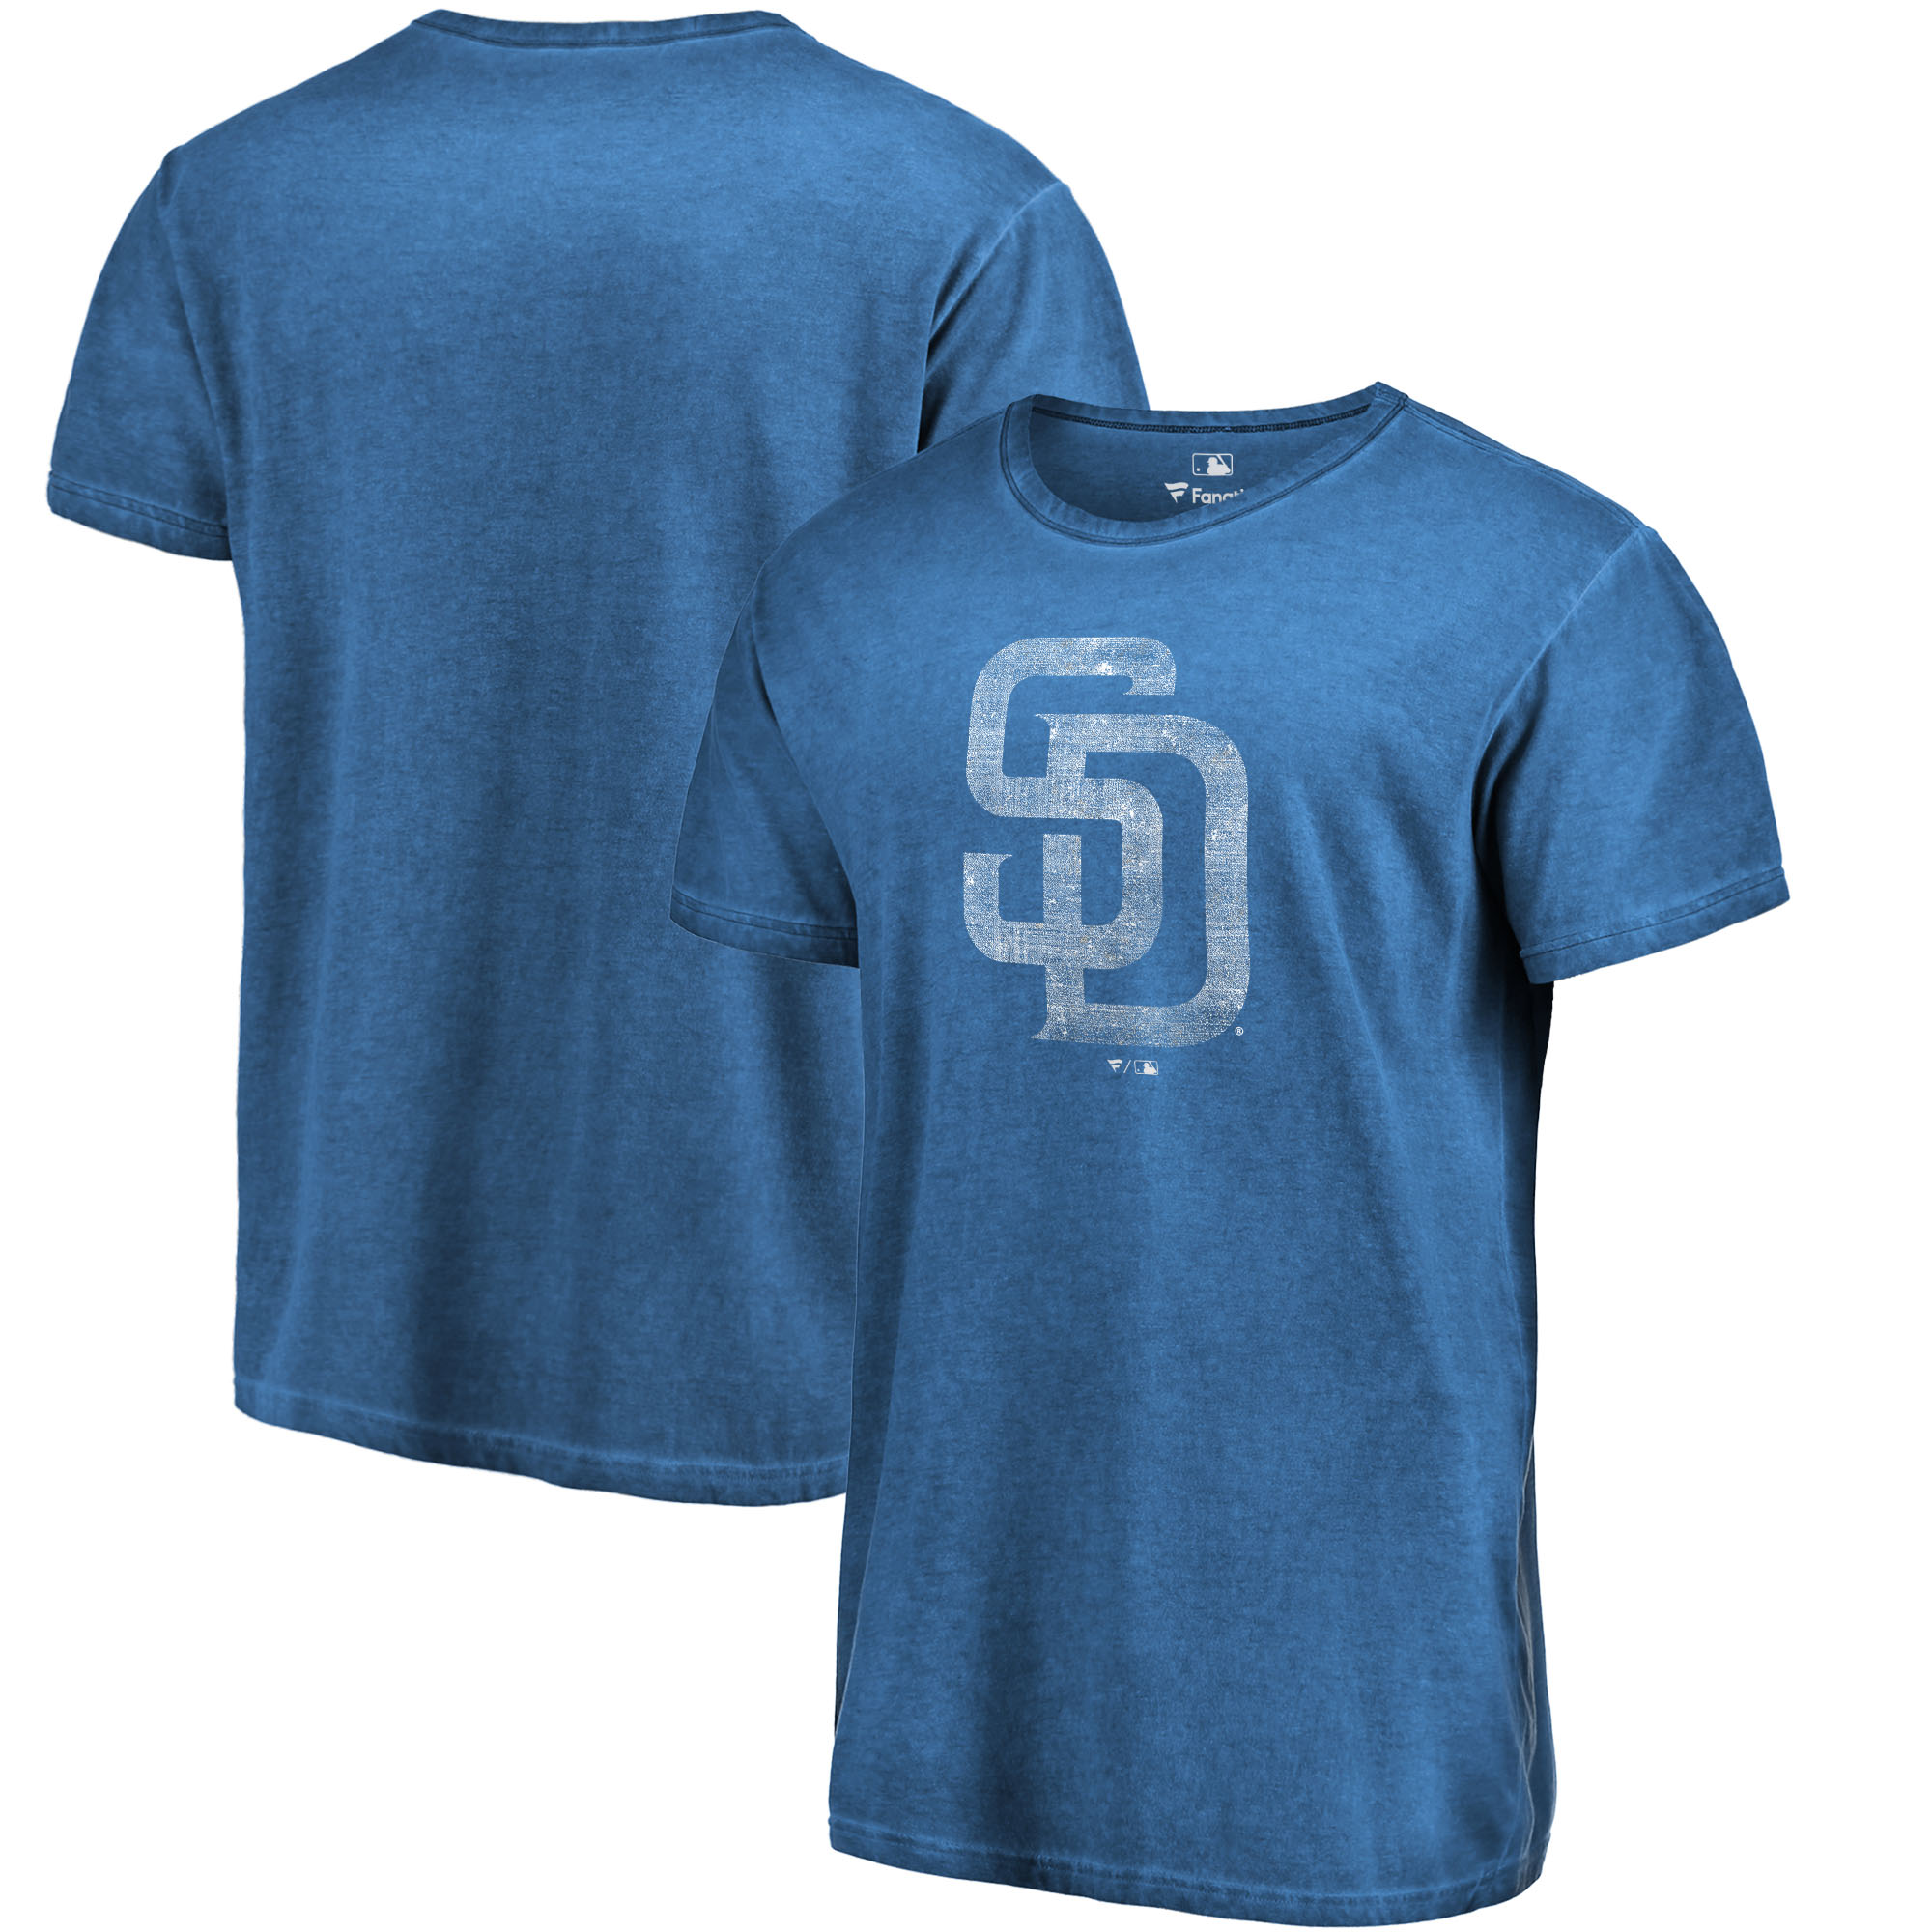 San Diego Padres Fanatics Branded Shadow Washed Logo T-Shirt - Navy